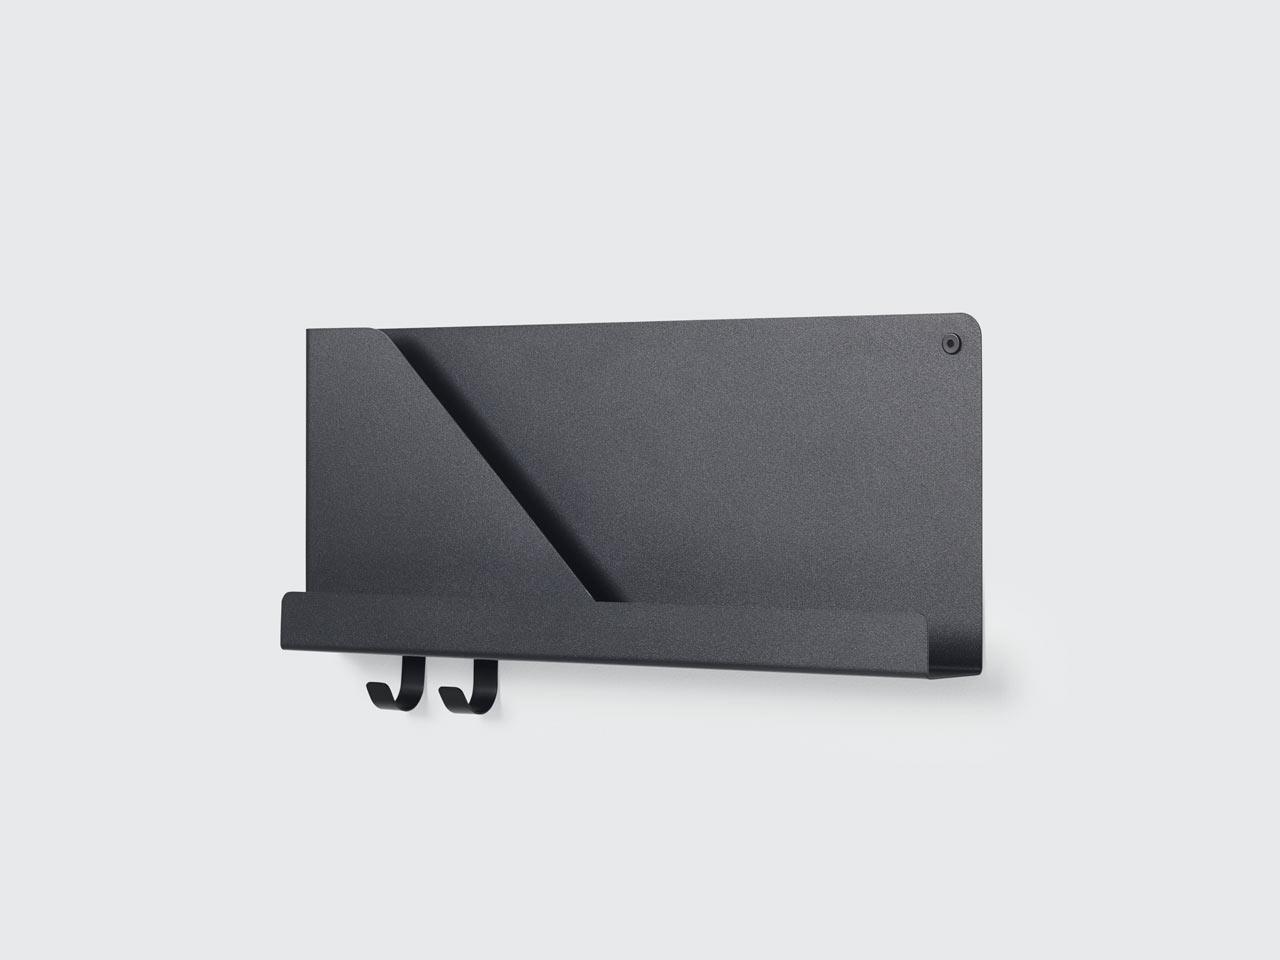 Folded-Shelf-Muuto-Johan-van-Hengel-13